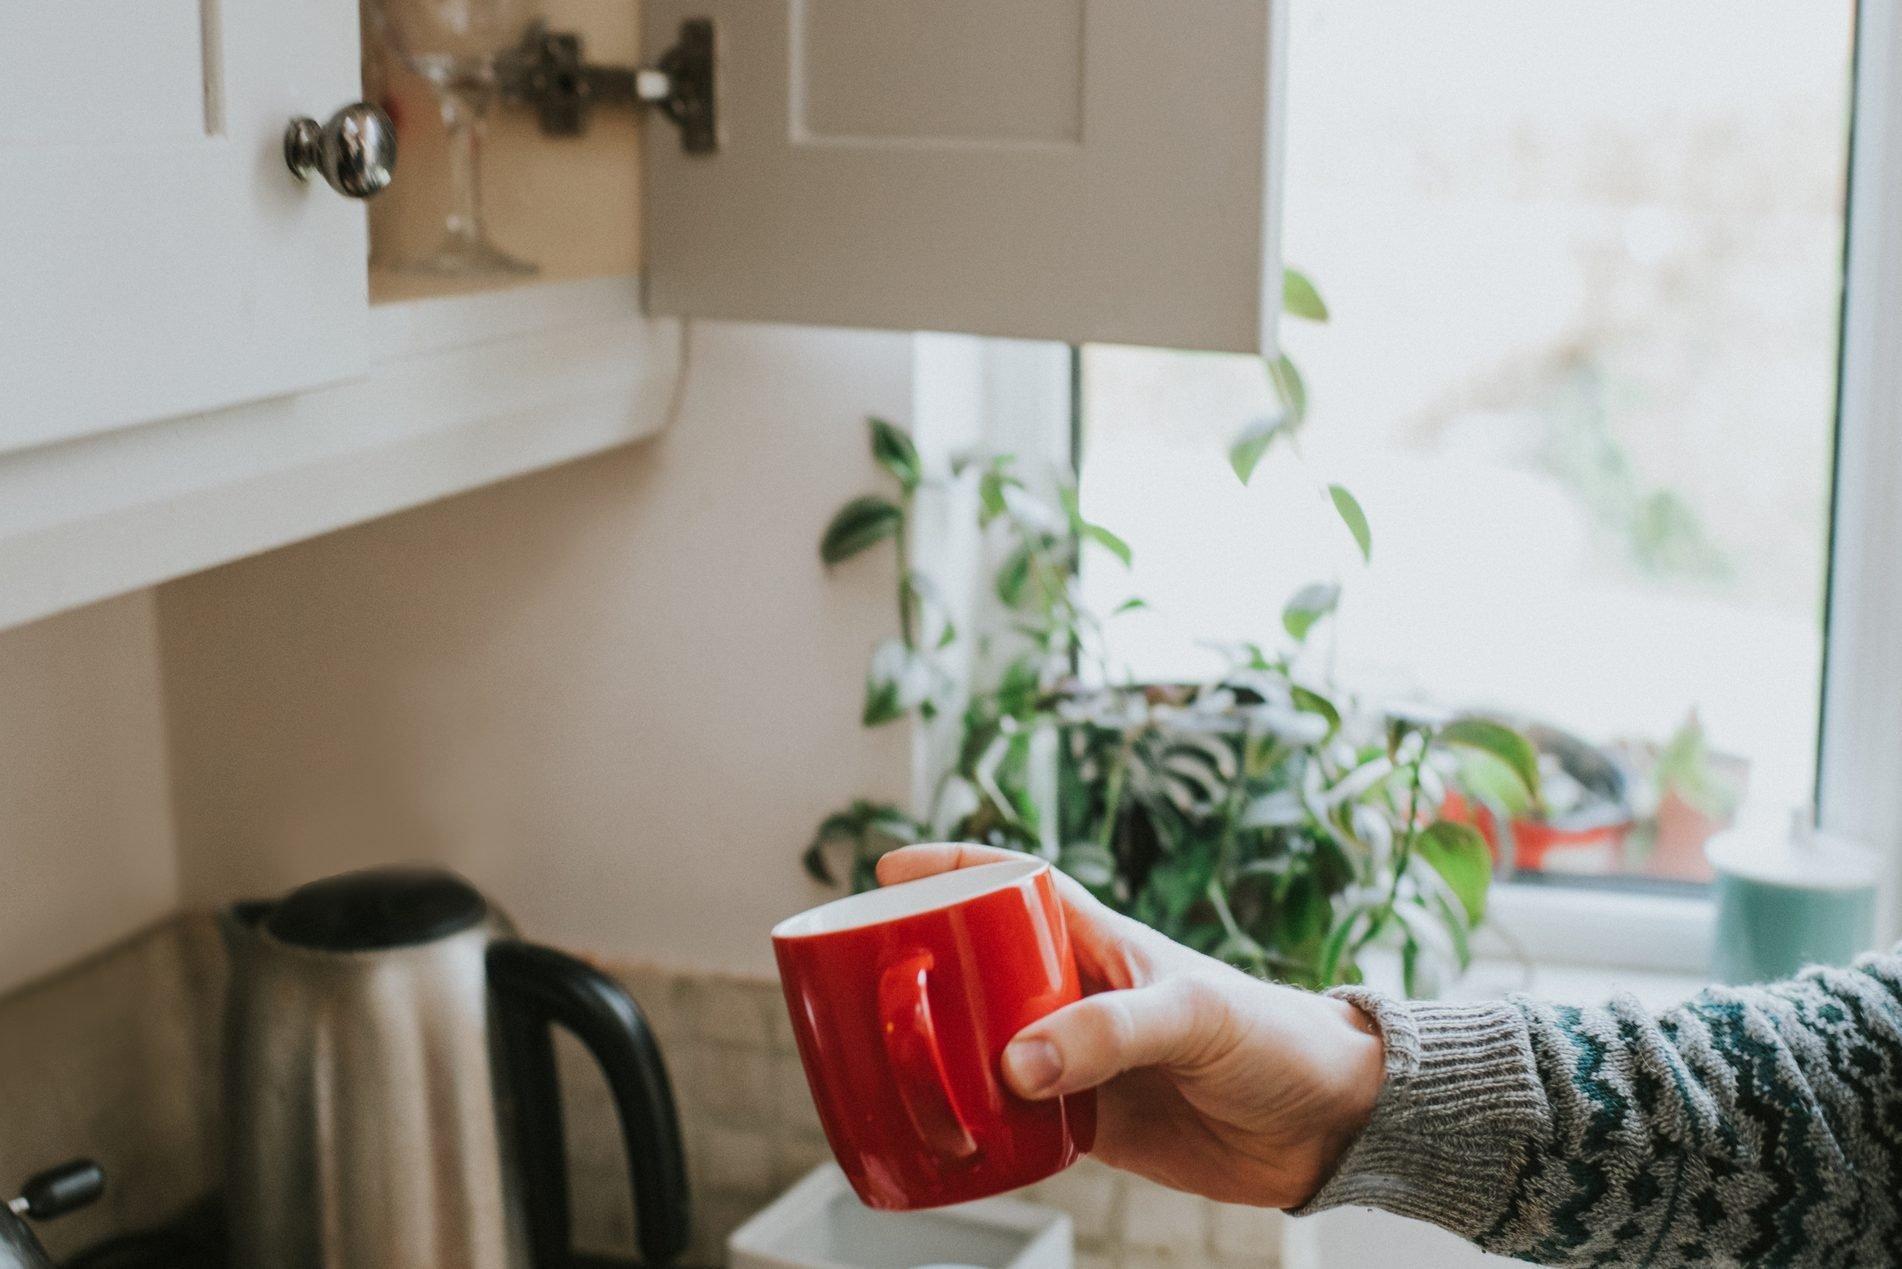 Do You Need to Wash Your Coffee Mug Every Day?